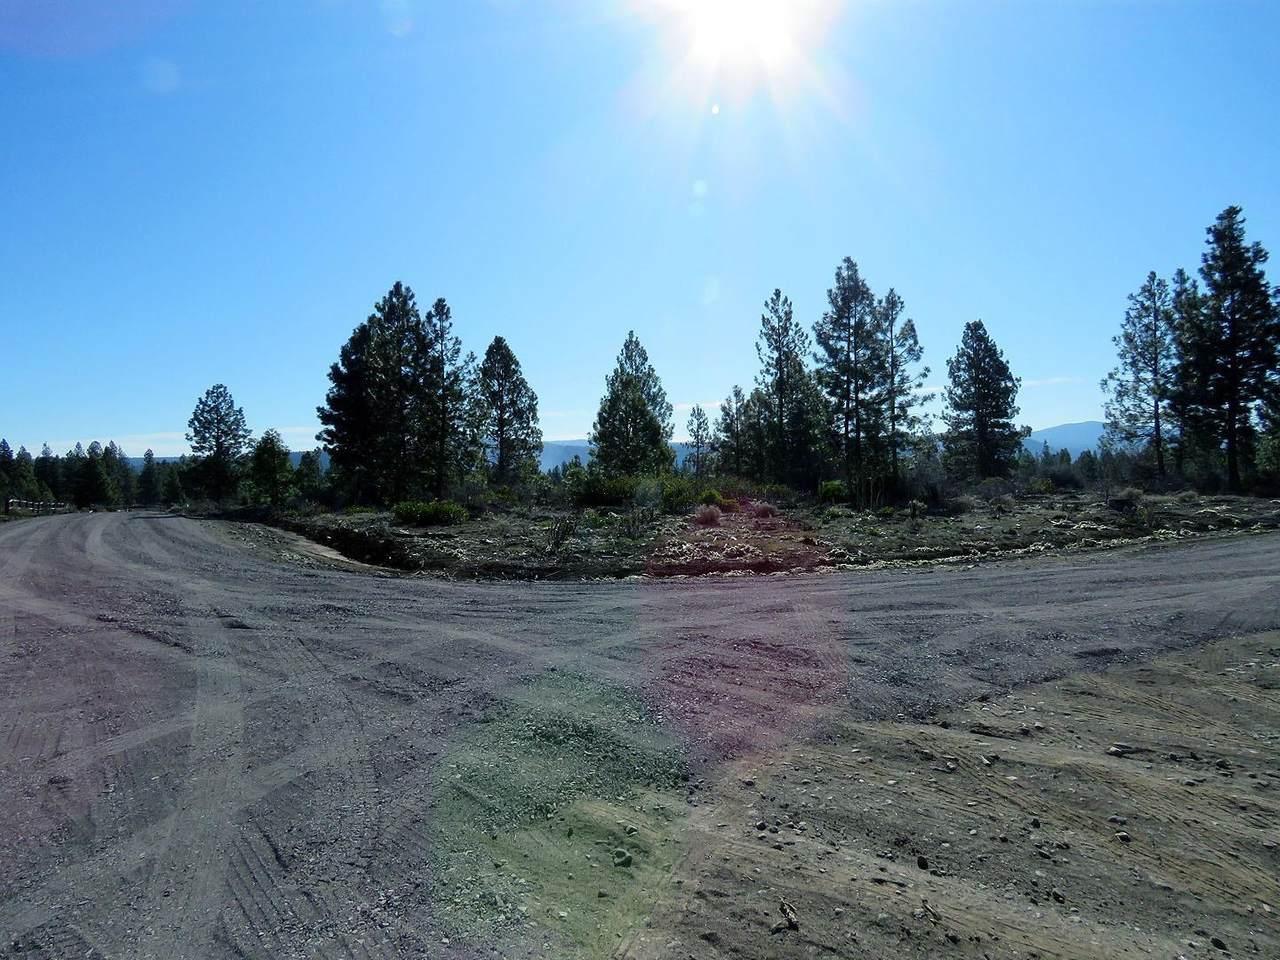 802 Highway 62 - Photo 1